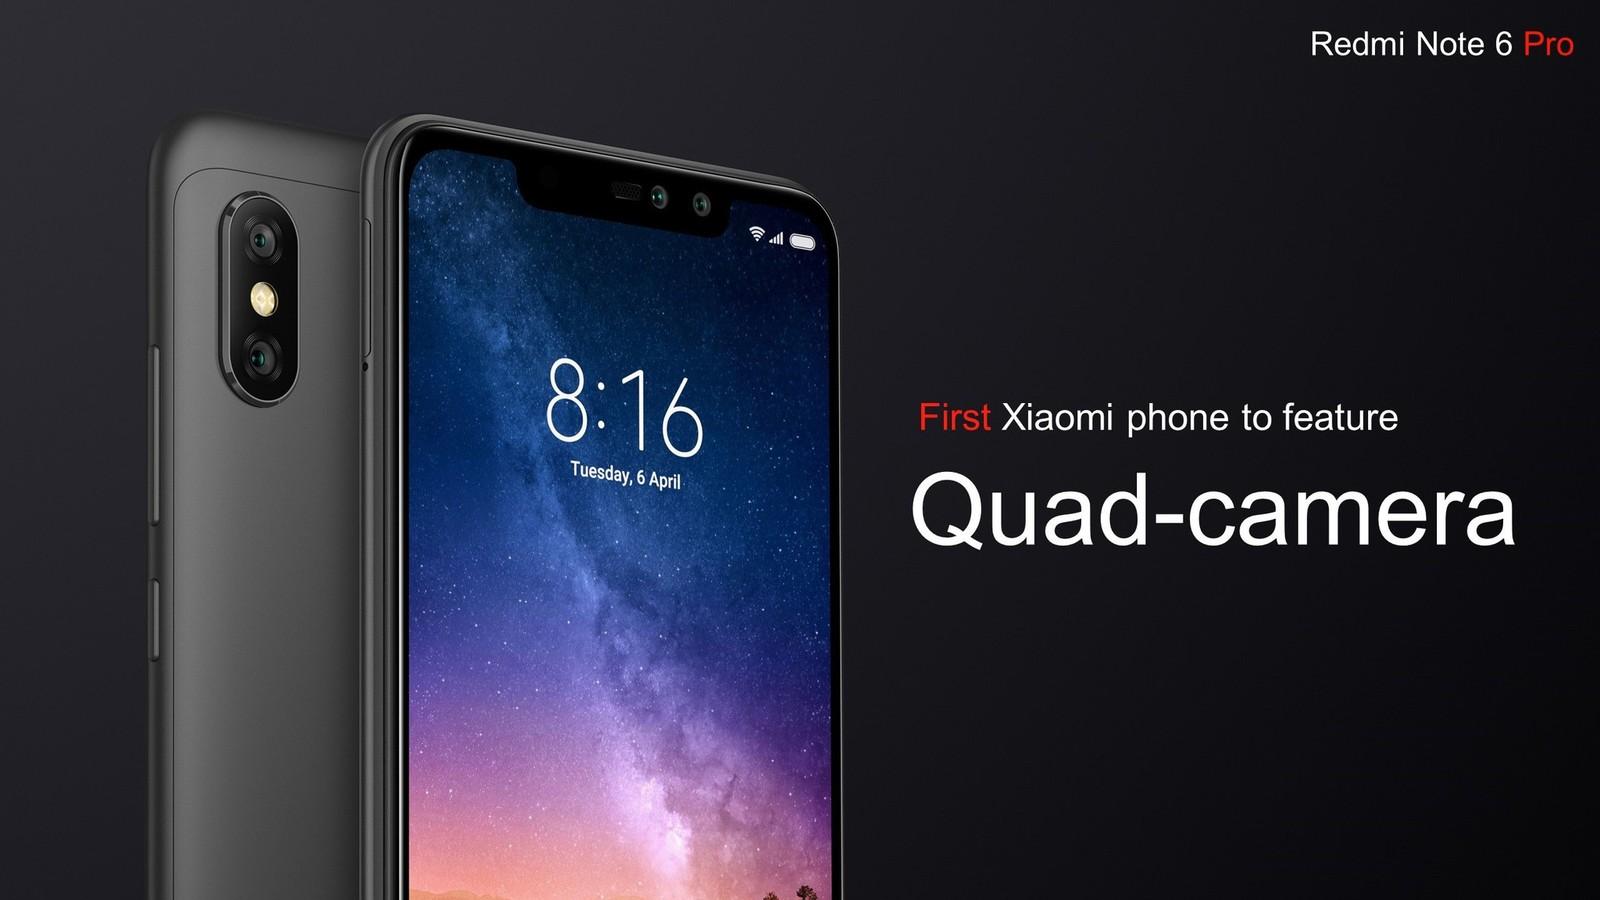 Xiaomi Redmi Note 6 Pro : Test des objectifs photo